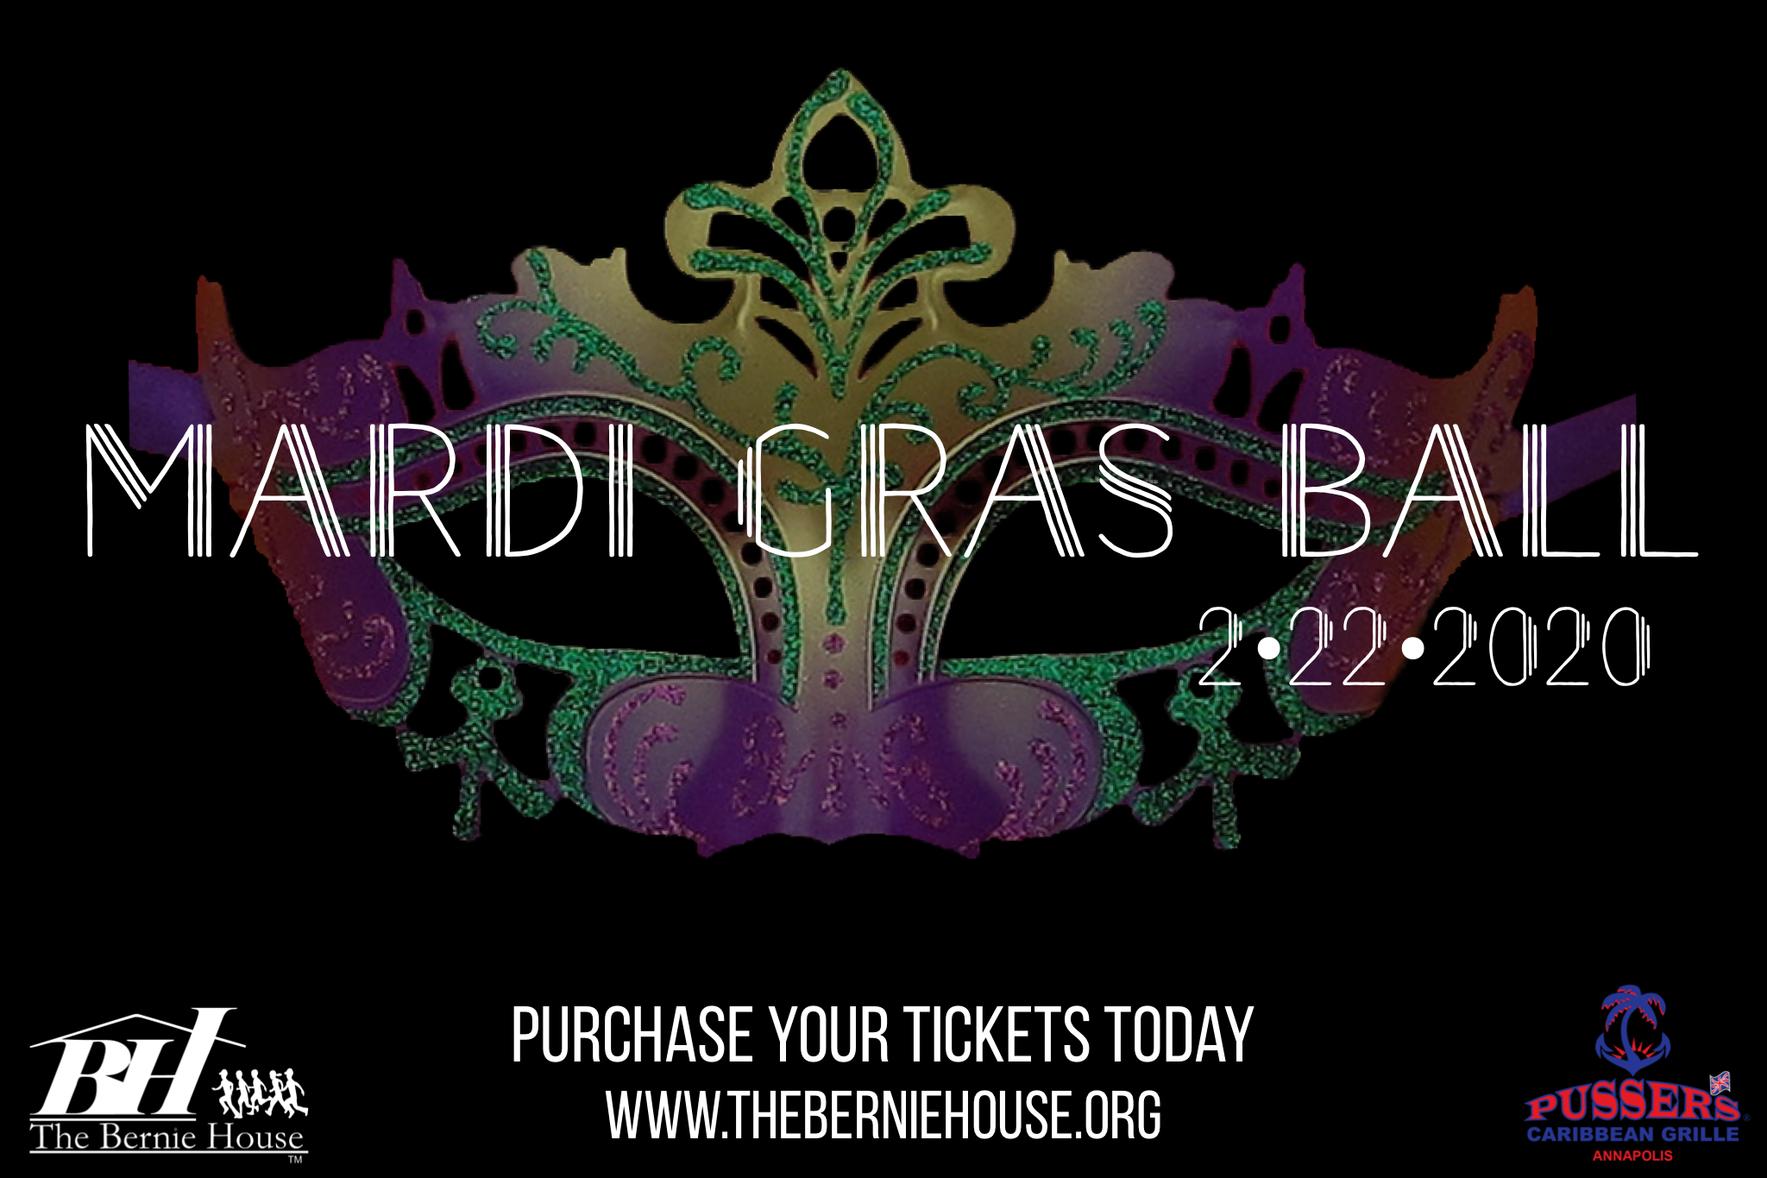 Mardi Gras Ball image